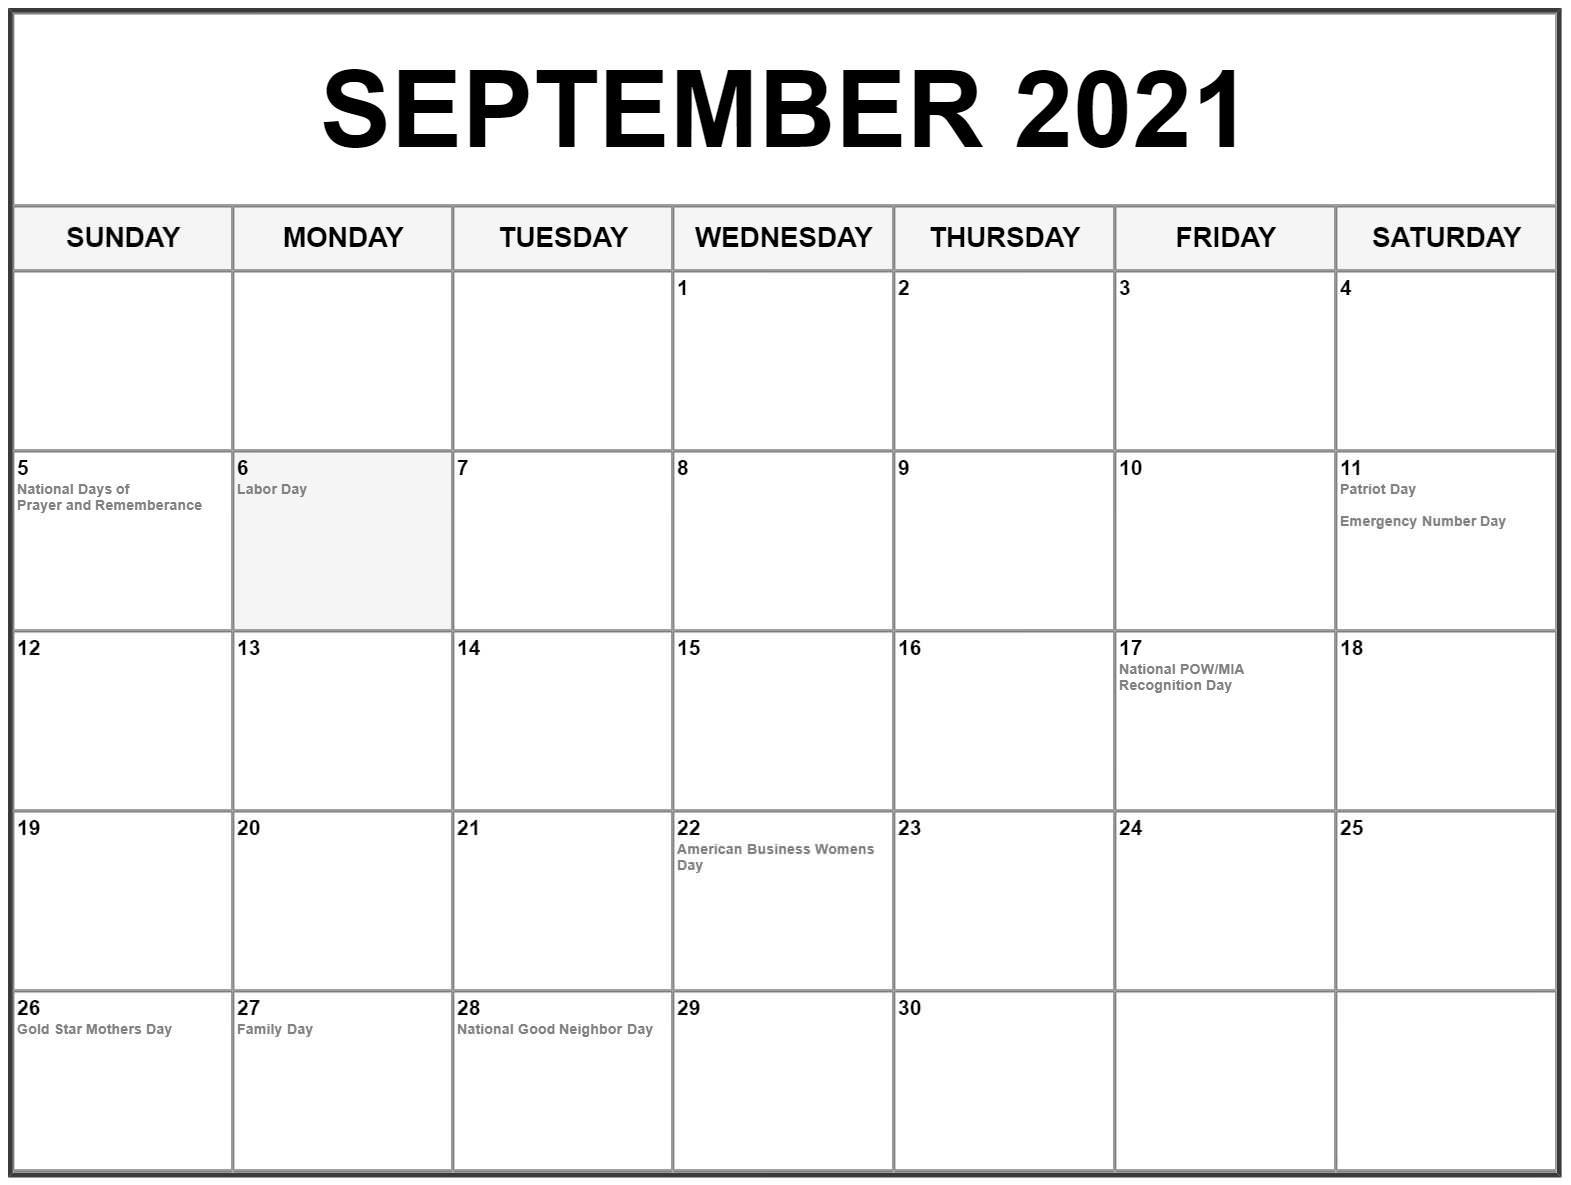 Print September 2021 Calendar with Holidays